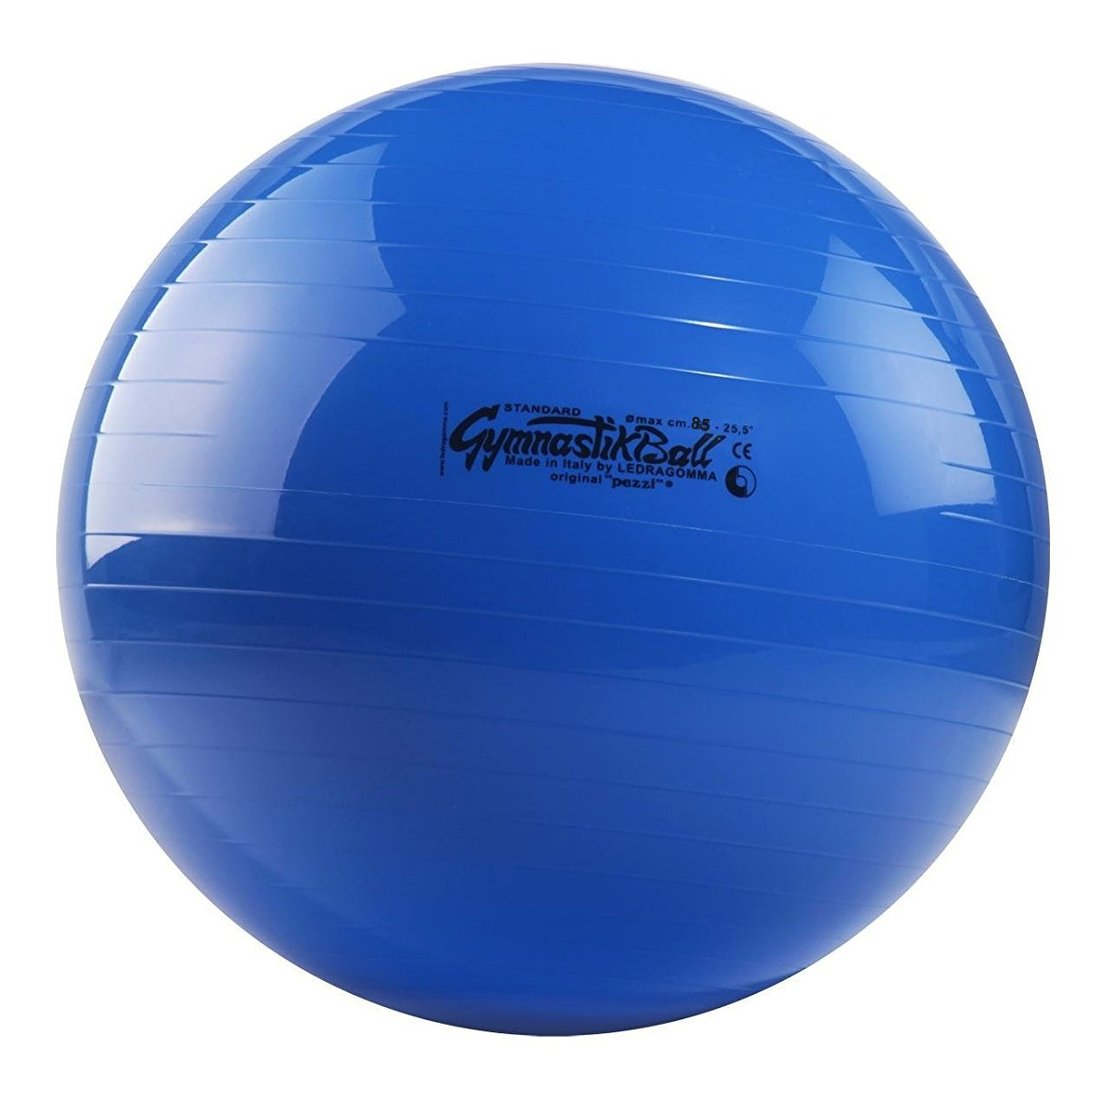 pezzi gymnastikball sitzball 85 cm blau outdoor ausr stung ruc. Black Bedroom Furniture Sets. Home Design Ideas